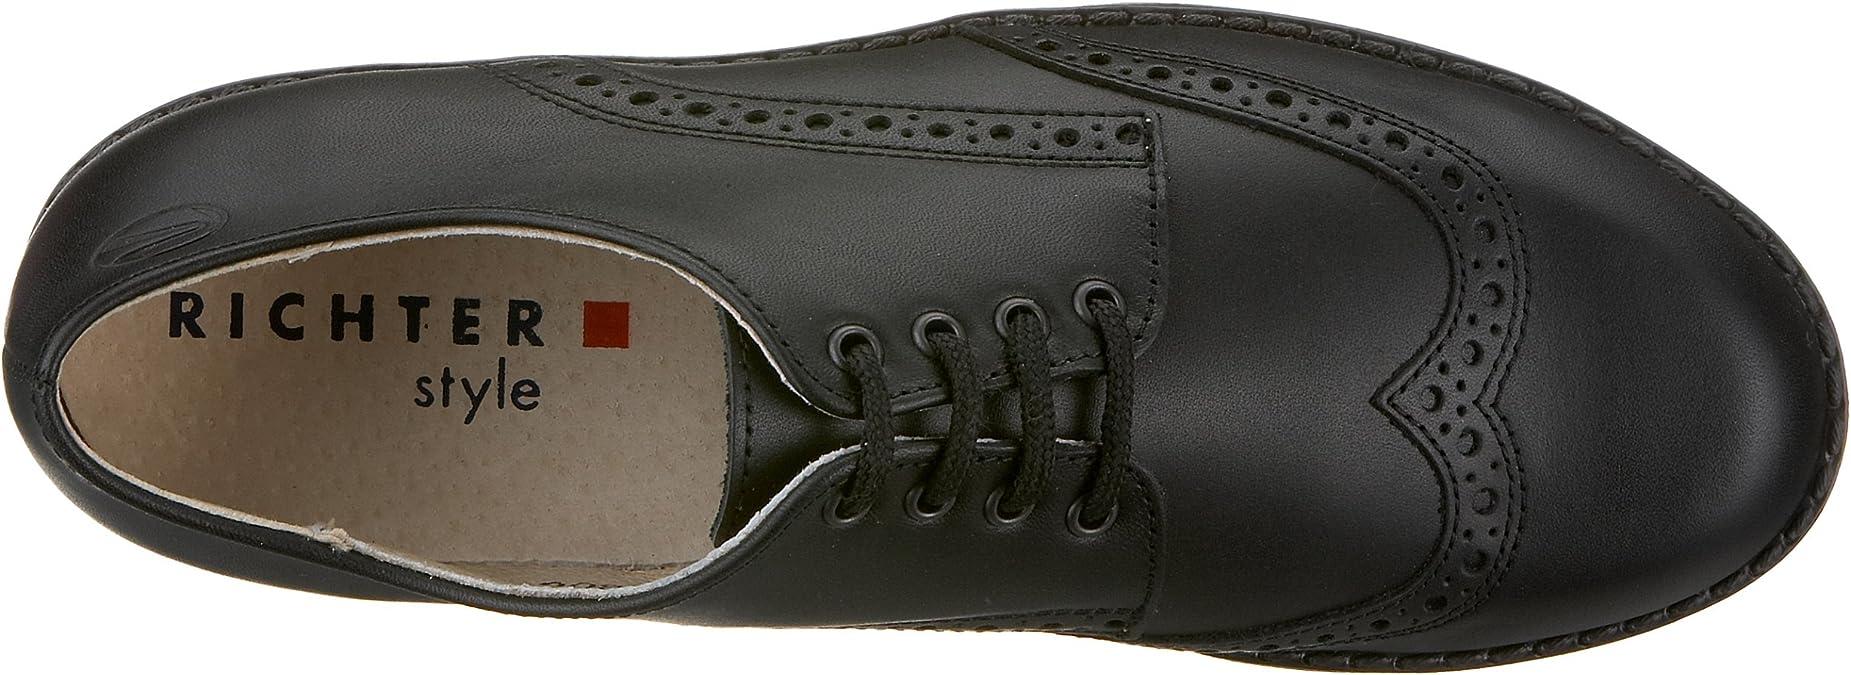 schwarz 1020 Jungen Klassische Halbschuhe schwarz, Richter Enrico 12.6030.1020